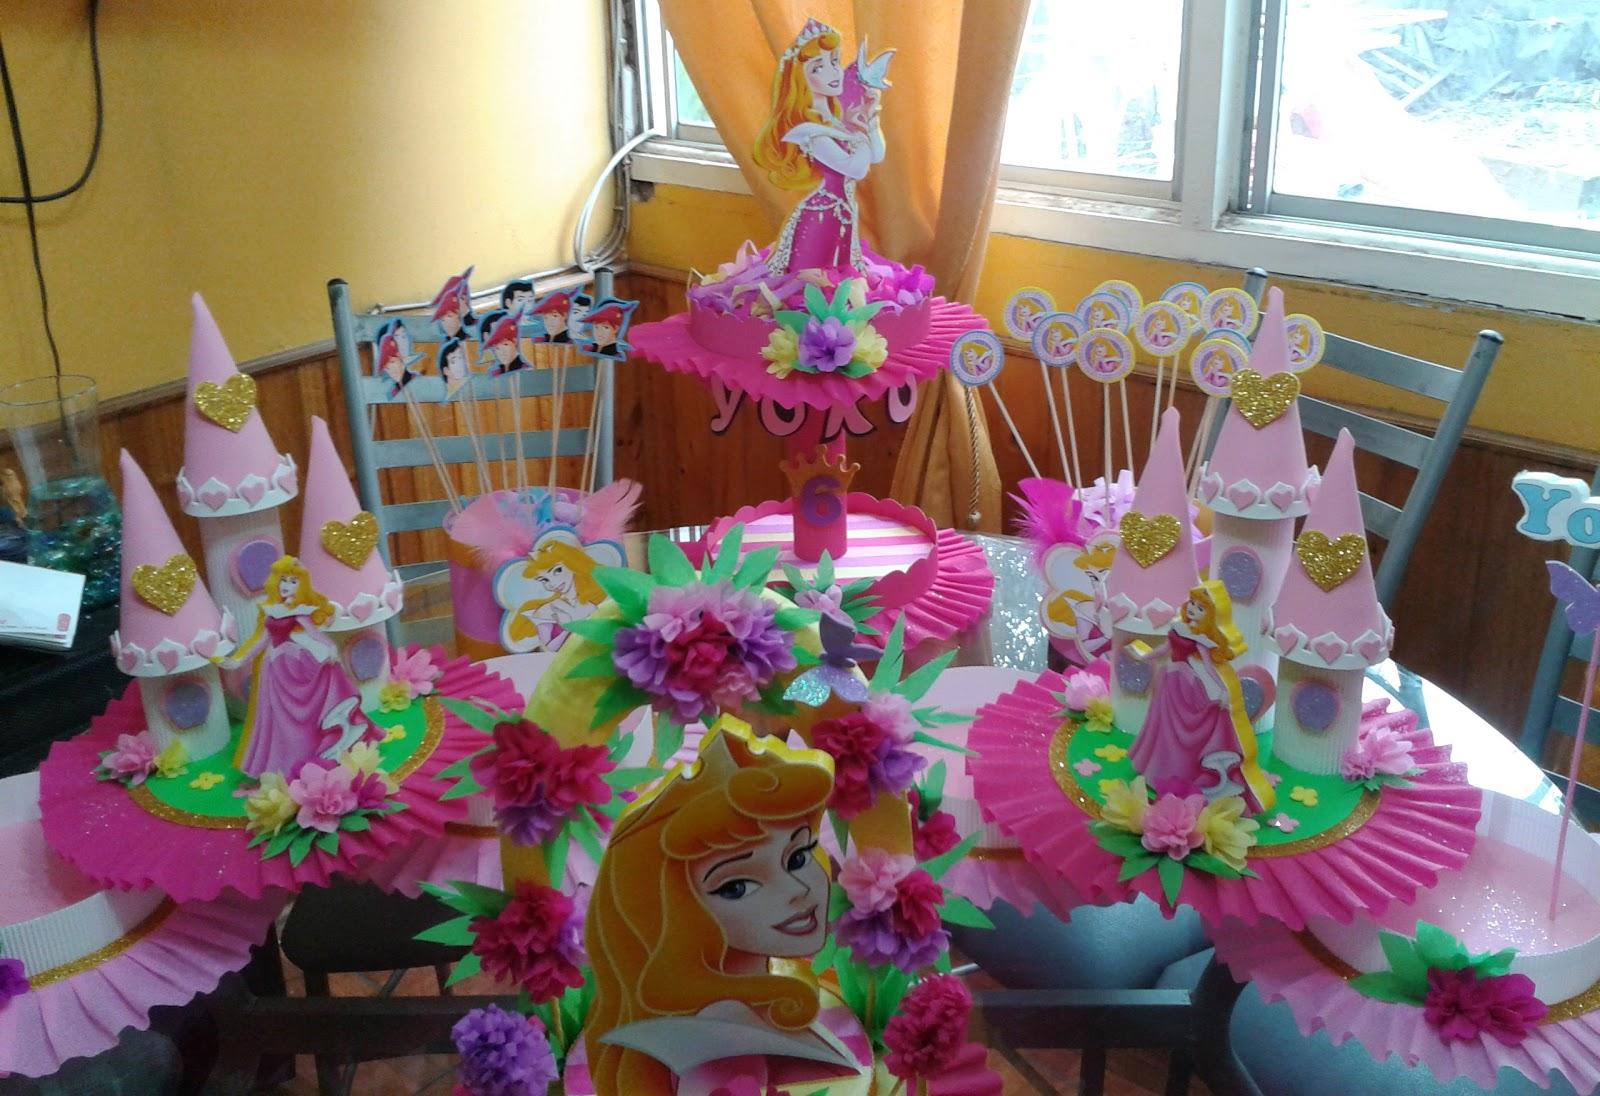 Decoraciones infantiles princesa aurora for Decoraciones infantiles